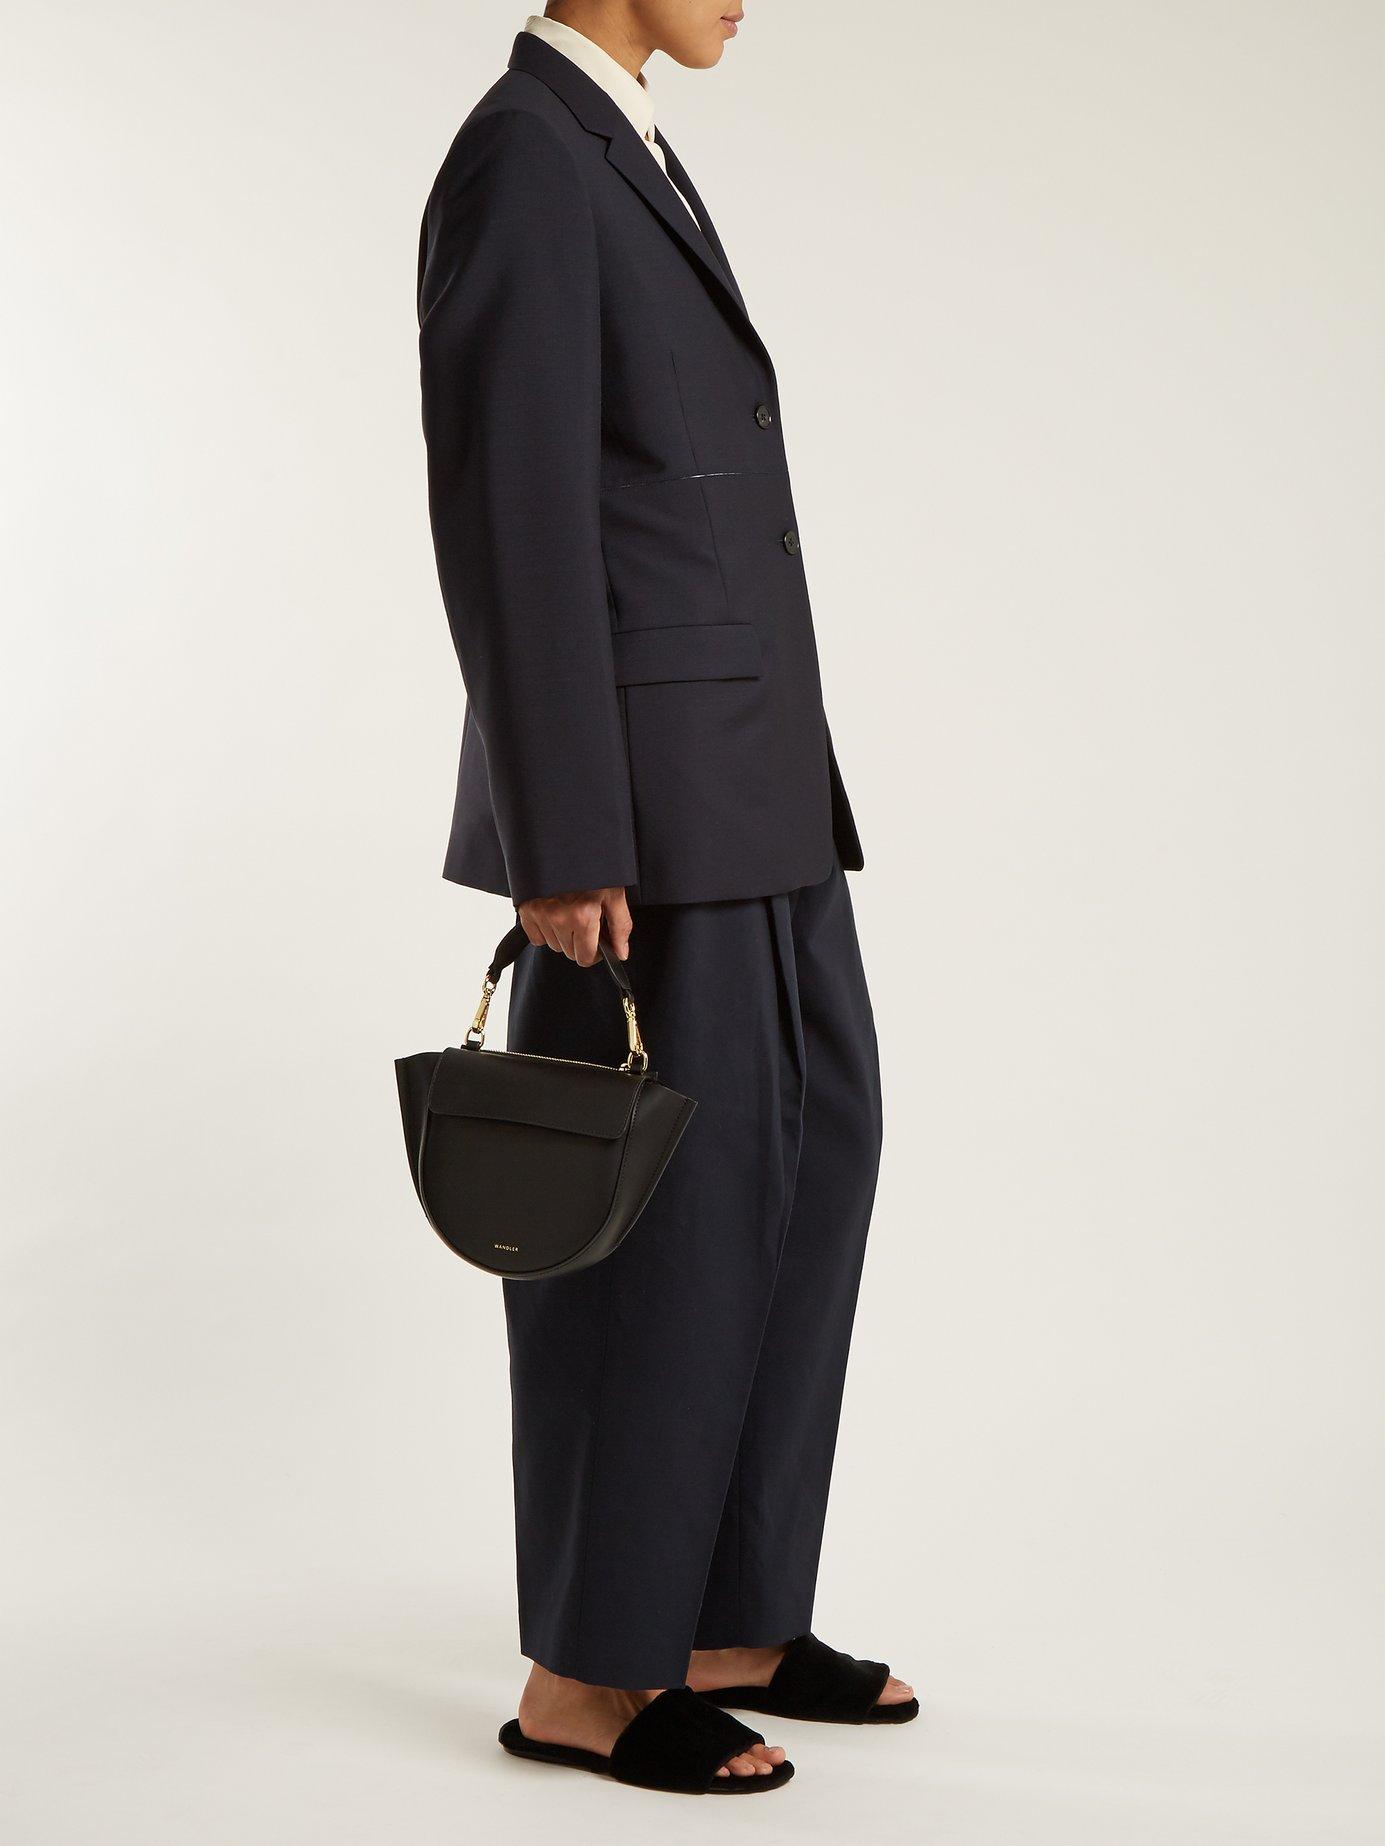 Emerson contrast-seam jacket by Jil Sander